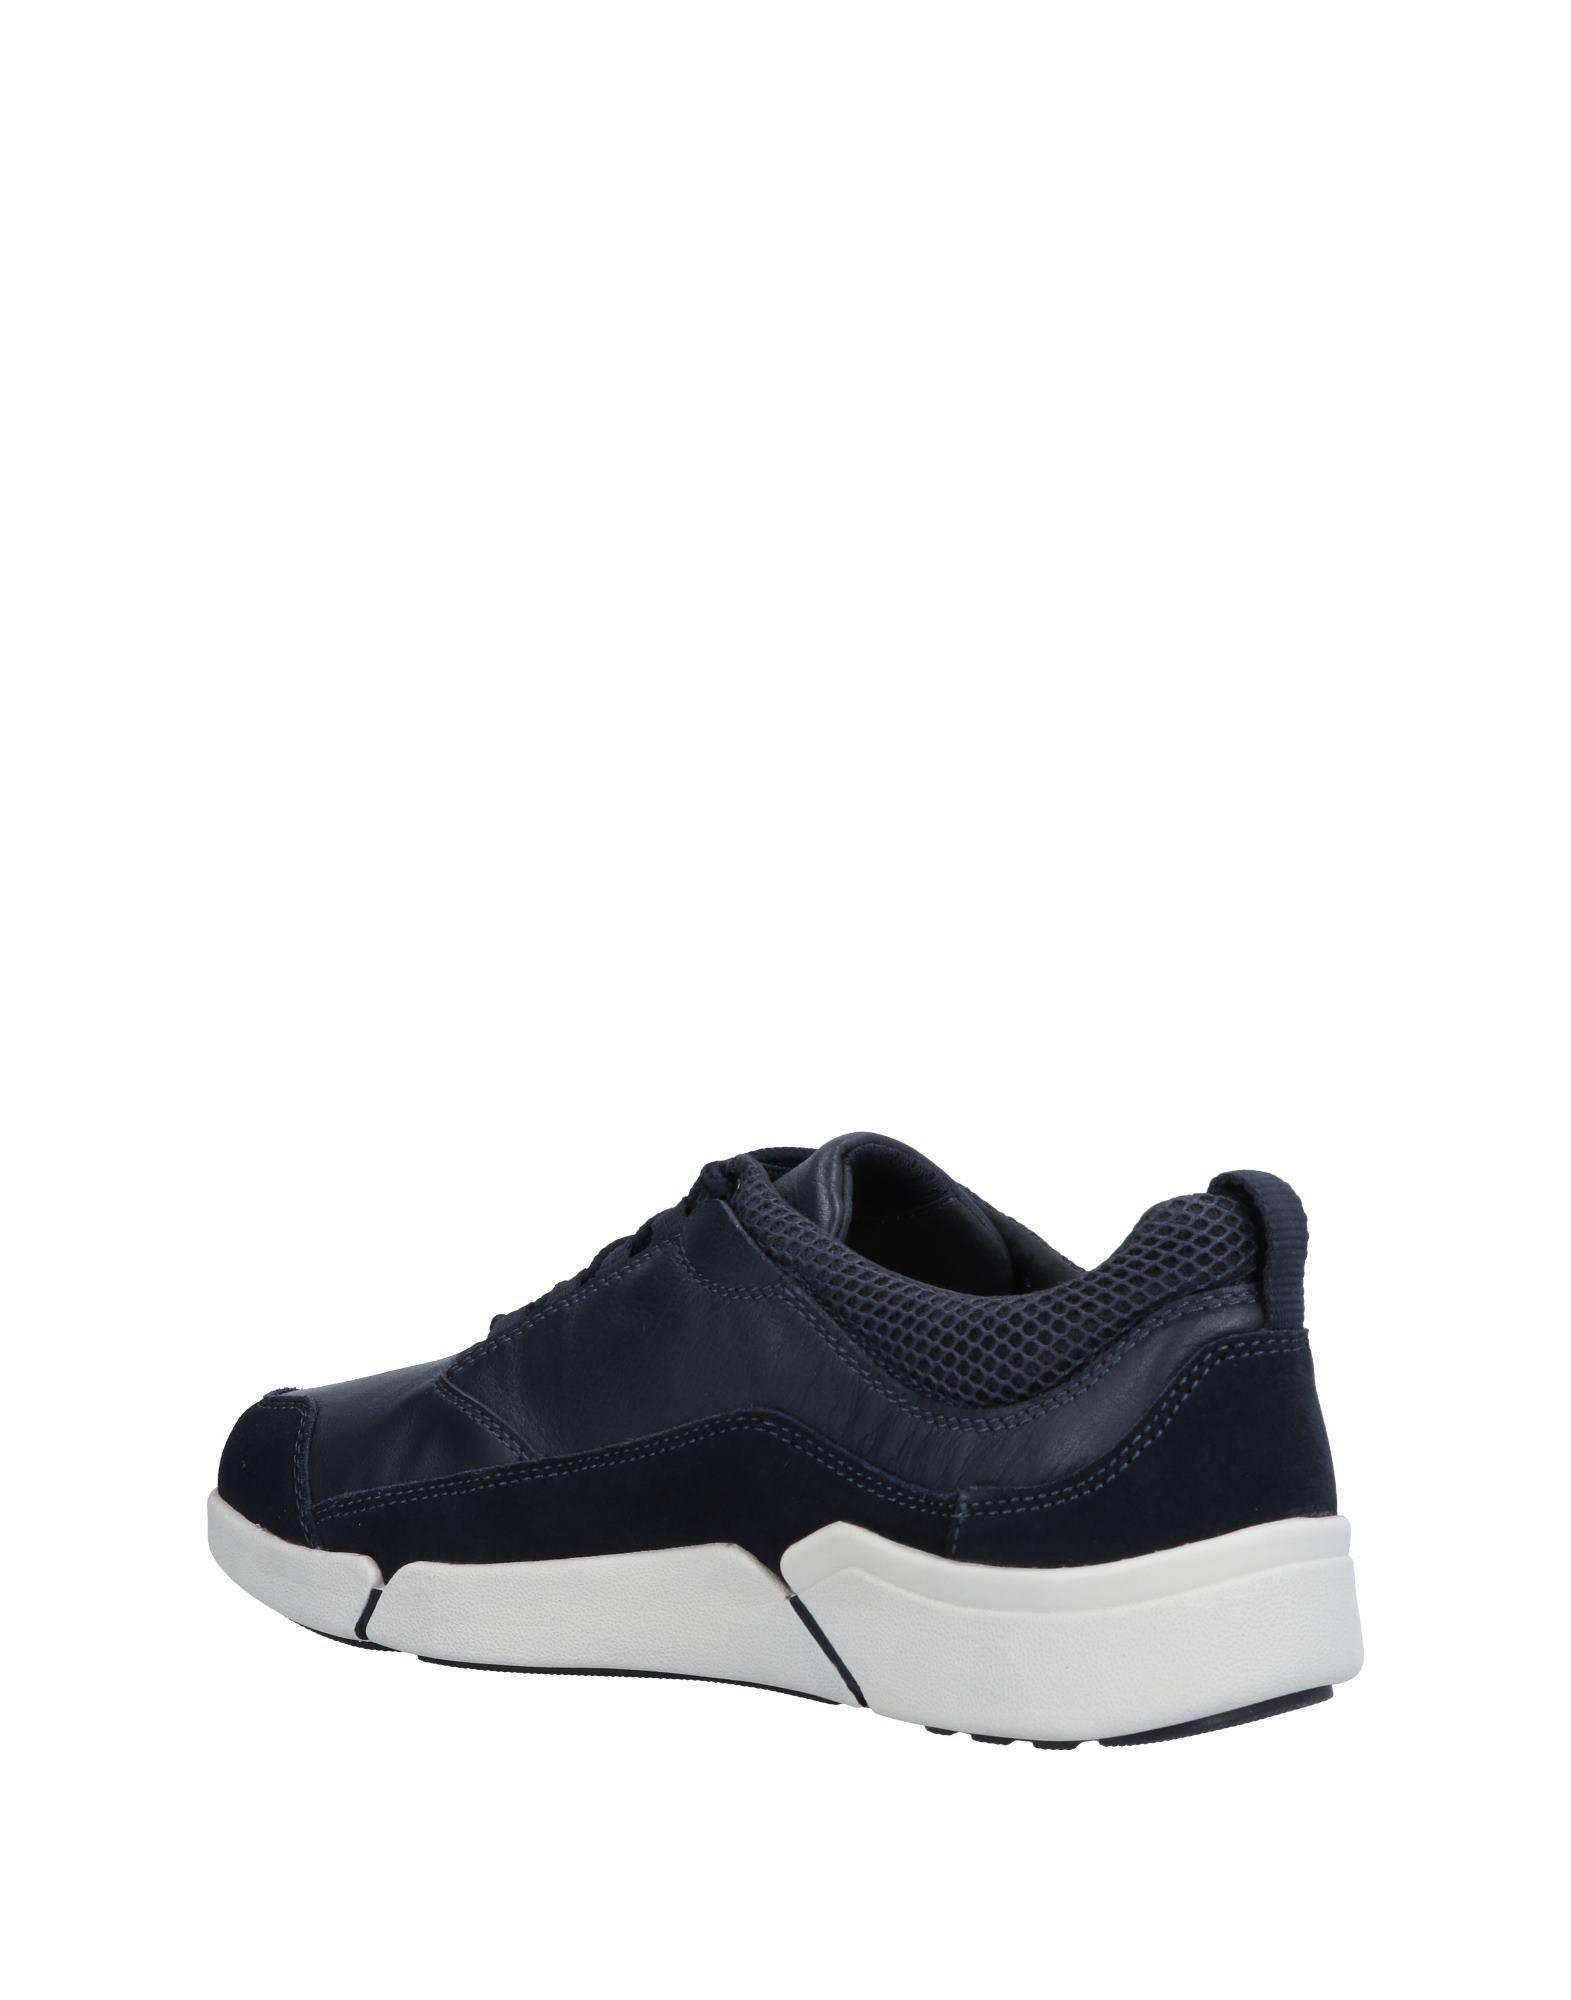 Geox Heiße Sneakers Herren  11496707MW Heiße Geox Schuhe 58d3bb